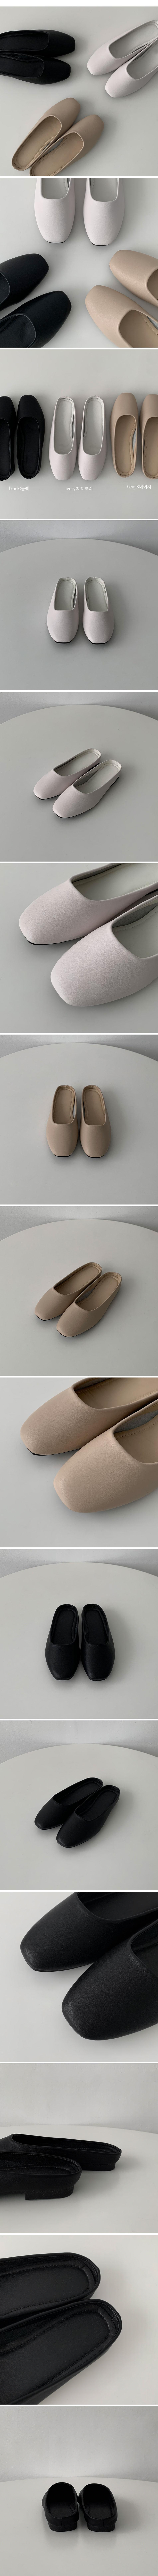 Melamule slippers